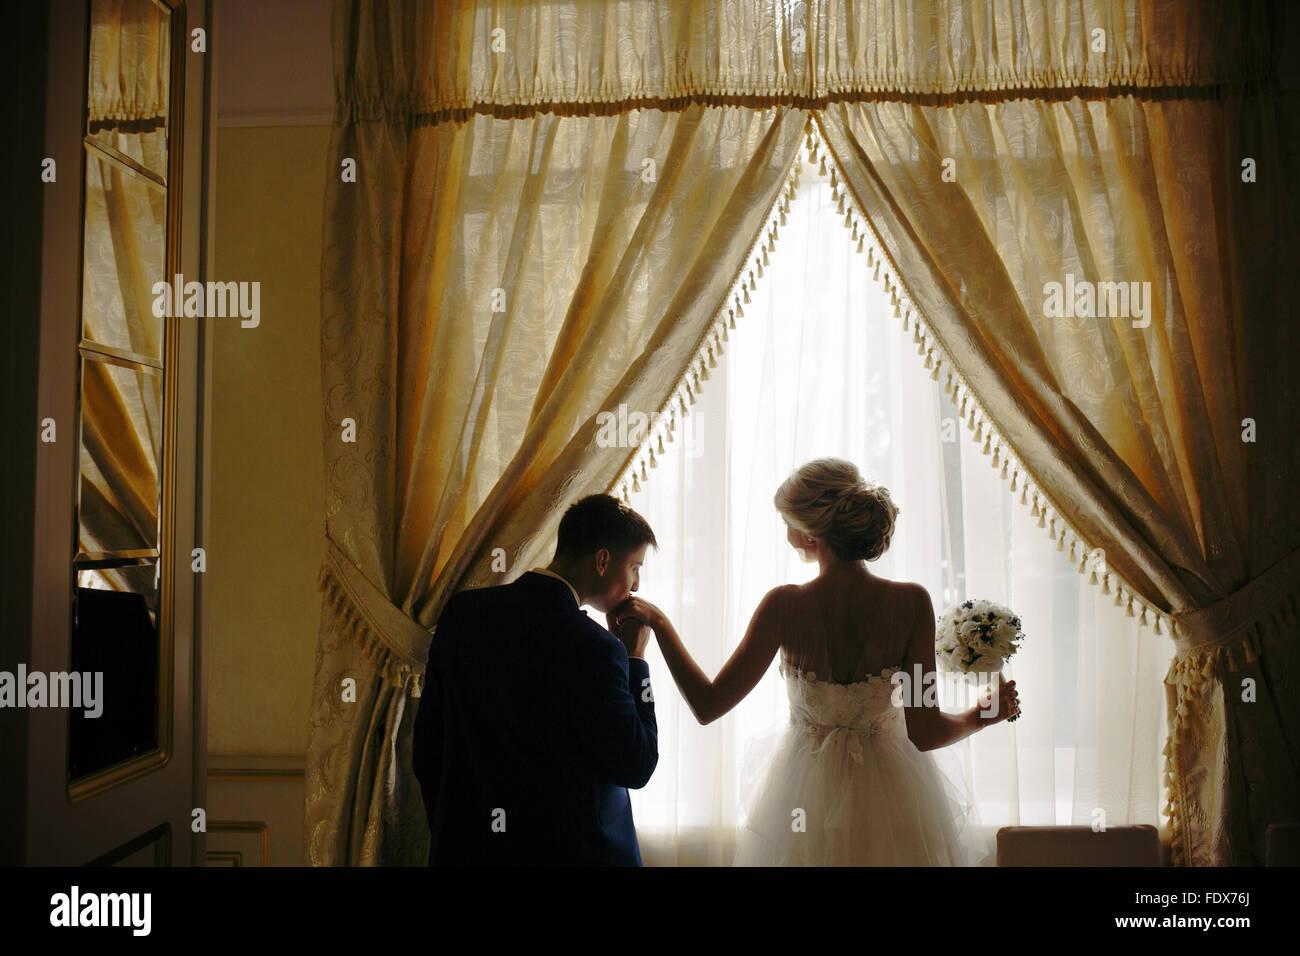 bride and groom standing in front of window - Stock Image